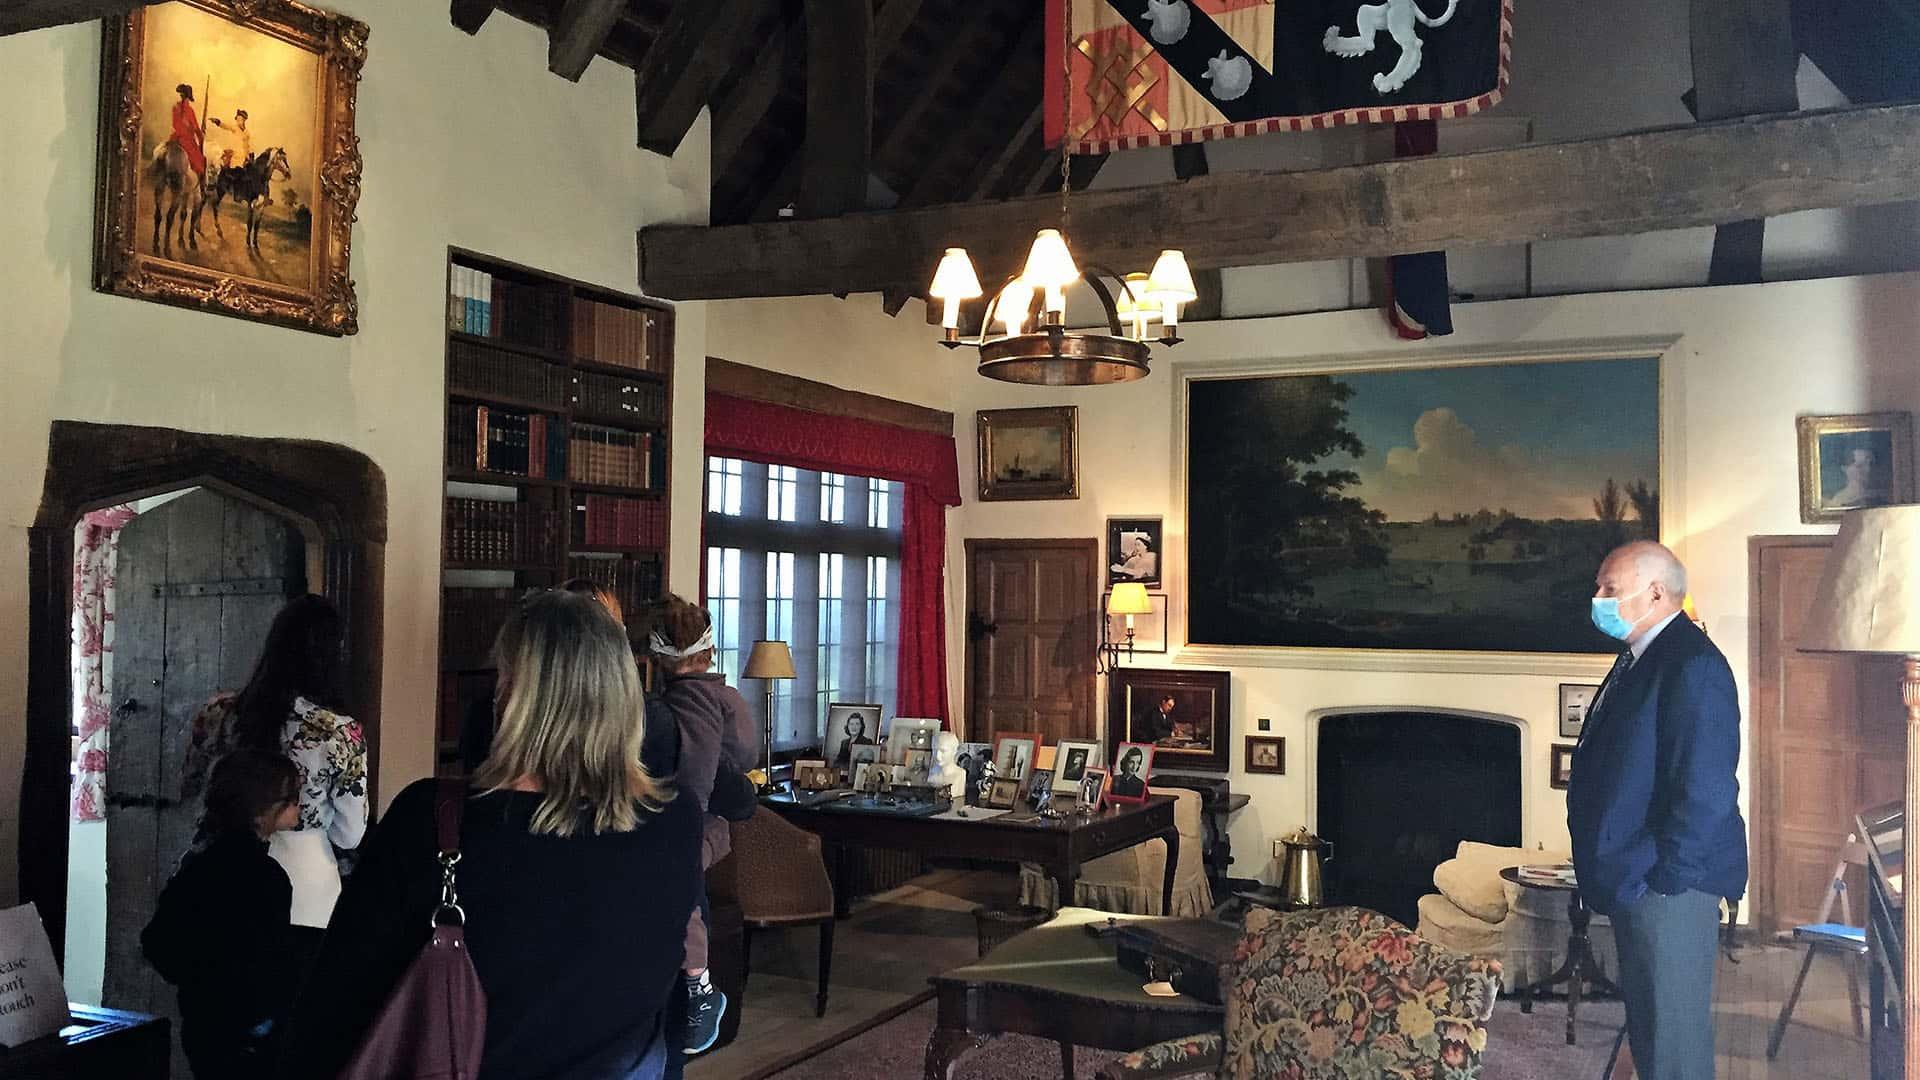 Inside Chartwell House